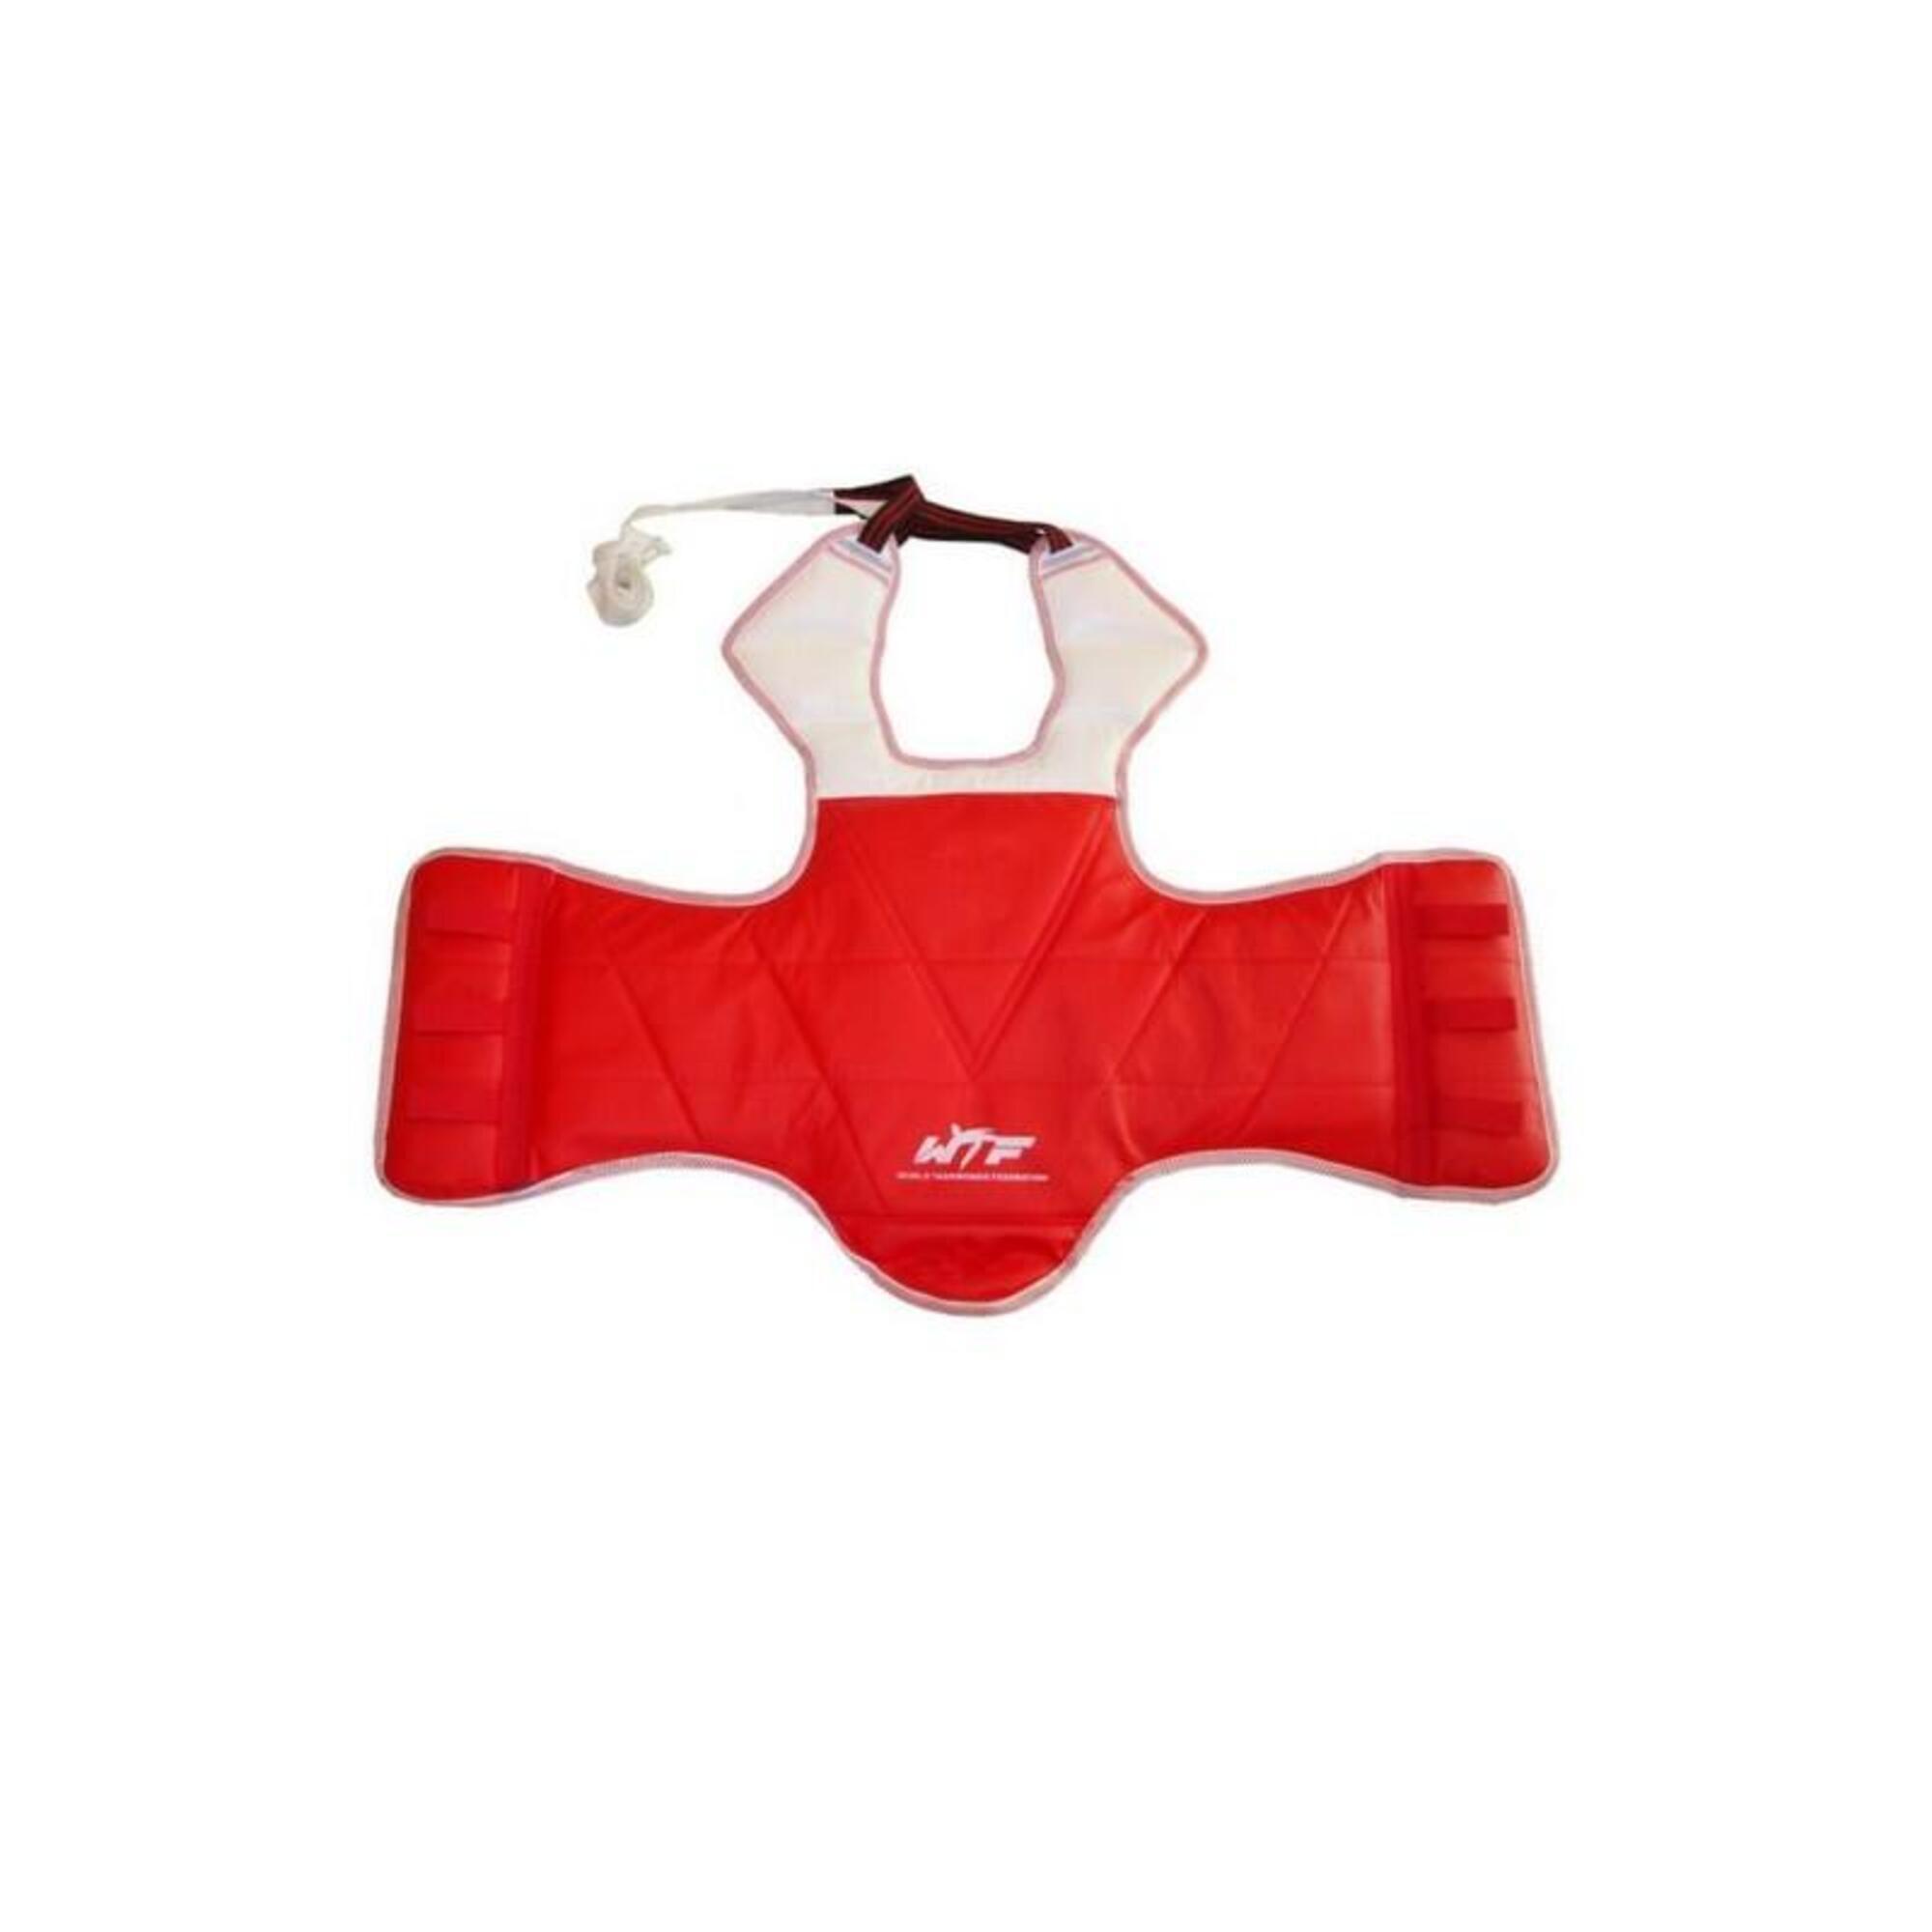 Taekwondo borstbeschermer WTF-goedgekeurde wedstrijd